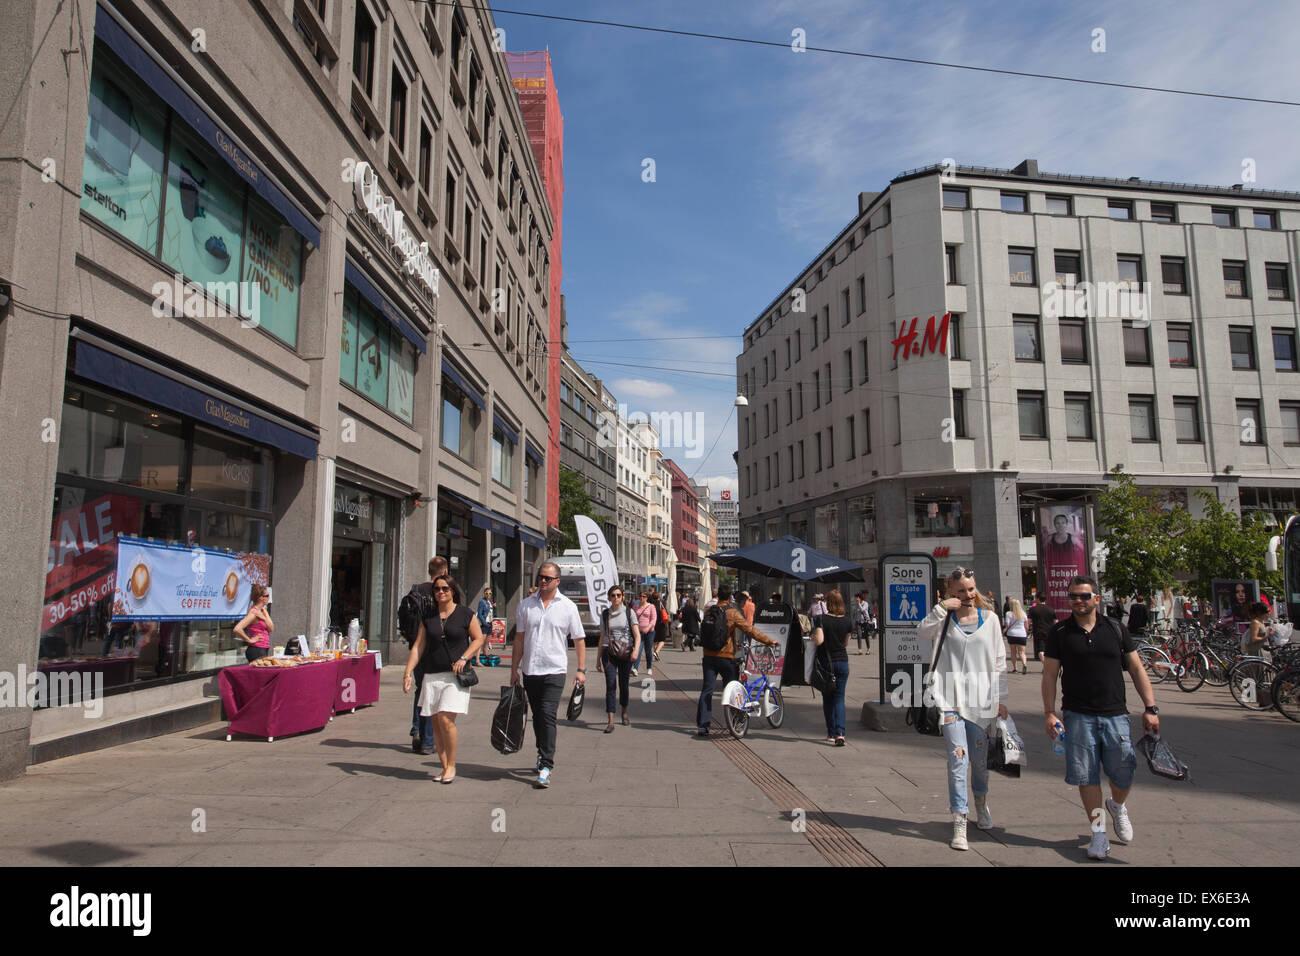 Torgata shopping street, Oslo sentrum, Oslo, Norway - Stock Image